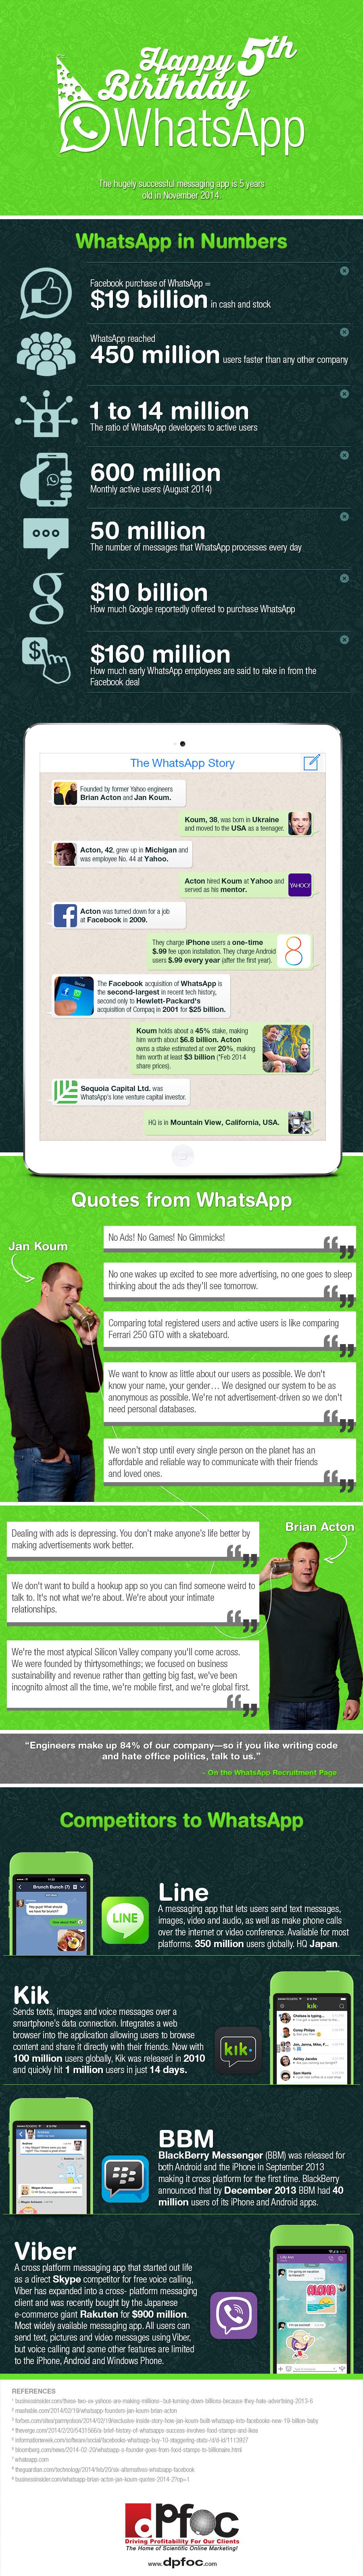 "Fünf Jahre WhatsApp. (Infografik: <a href=""http://www.dpfoc.com/"">DPFOC</a>)"